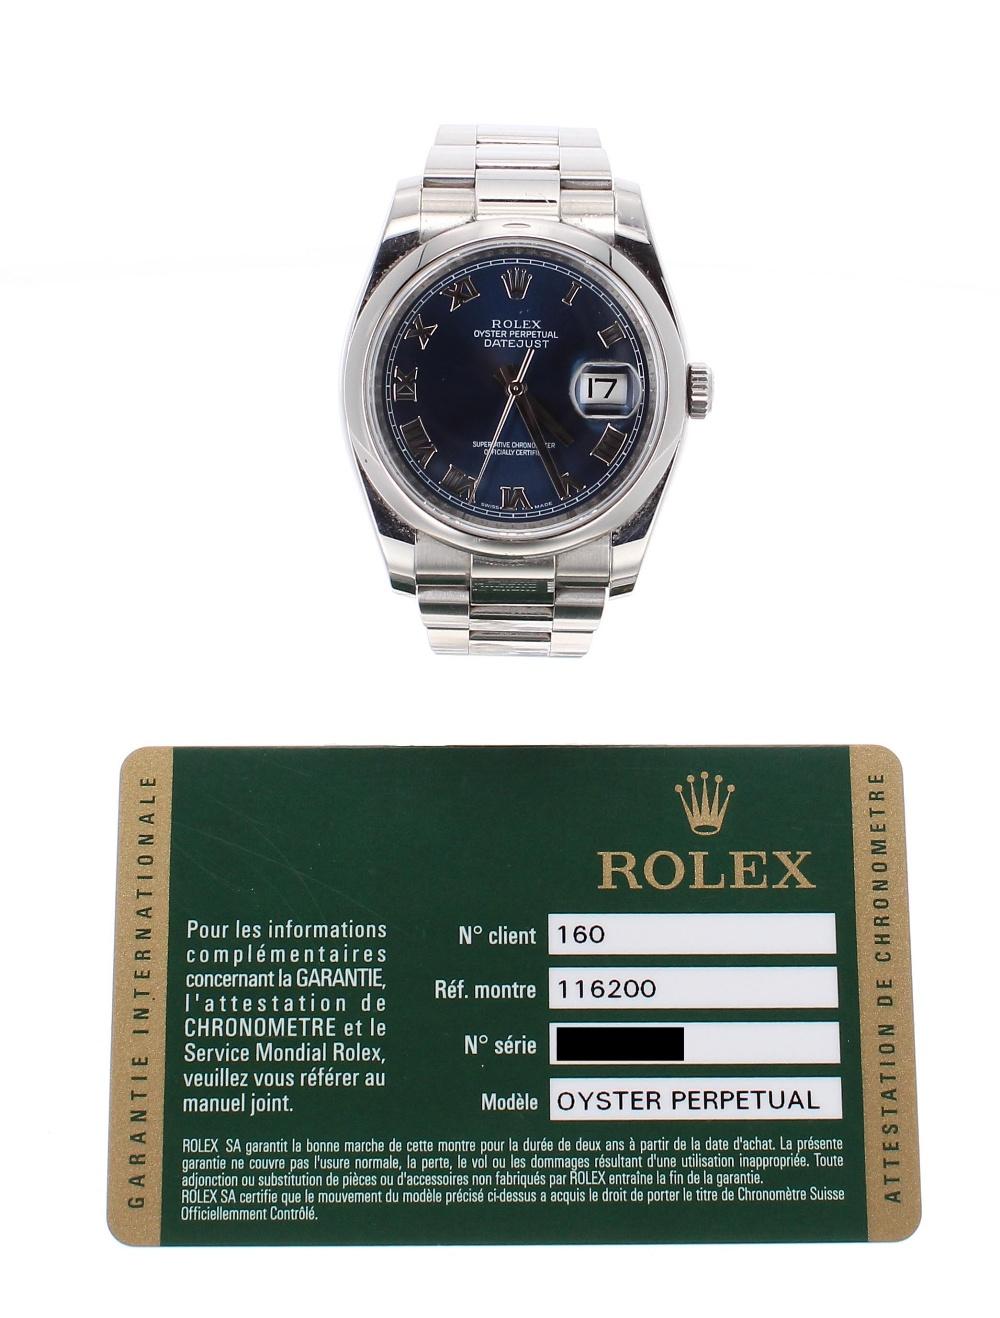 Lot 34 - Rolex Oyster Perpetual DateJust stainless steel gentleman's bracelet watch, ref. 116200, ser. no.